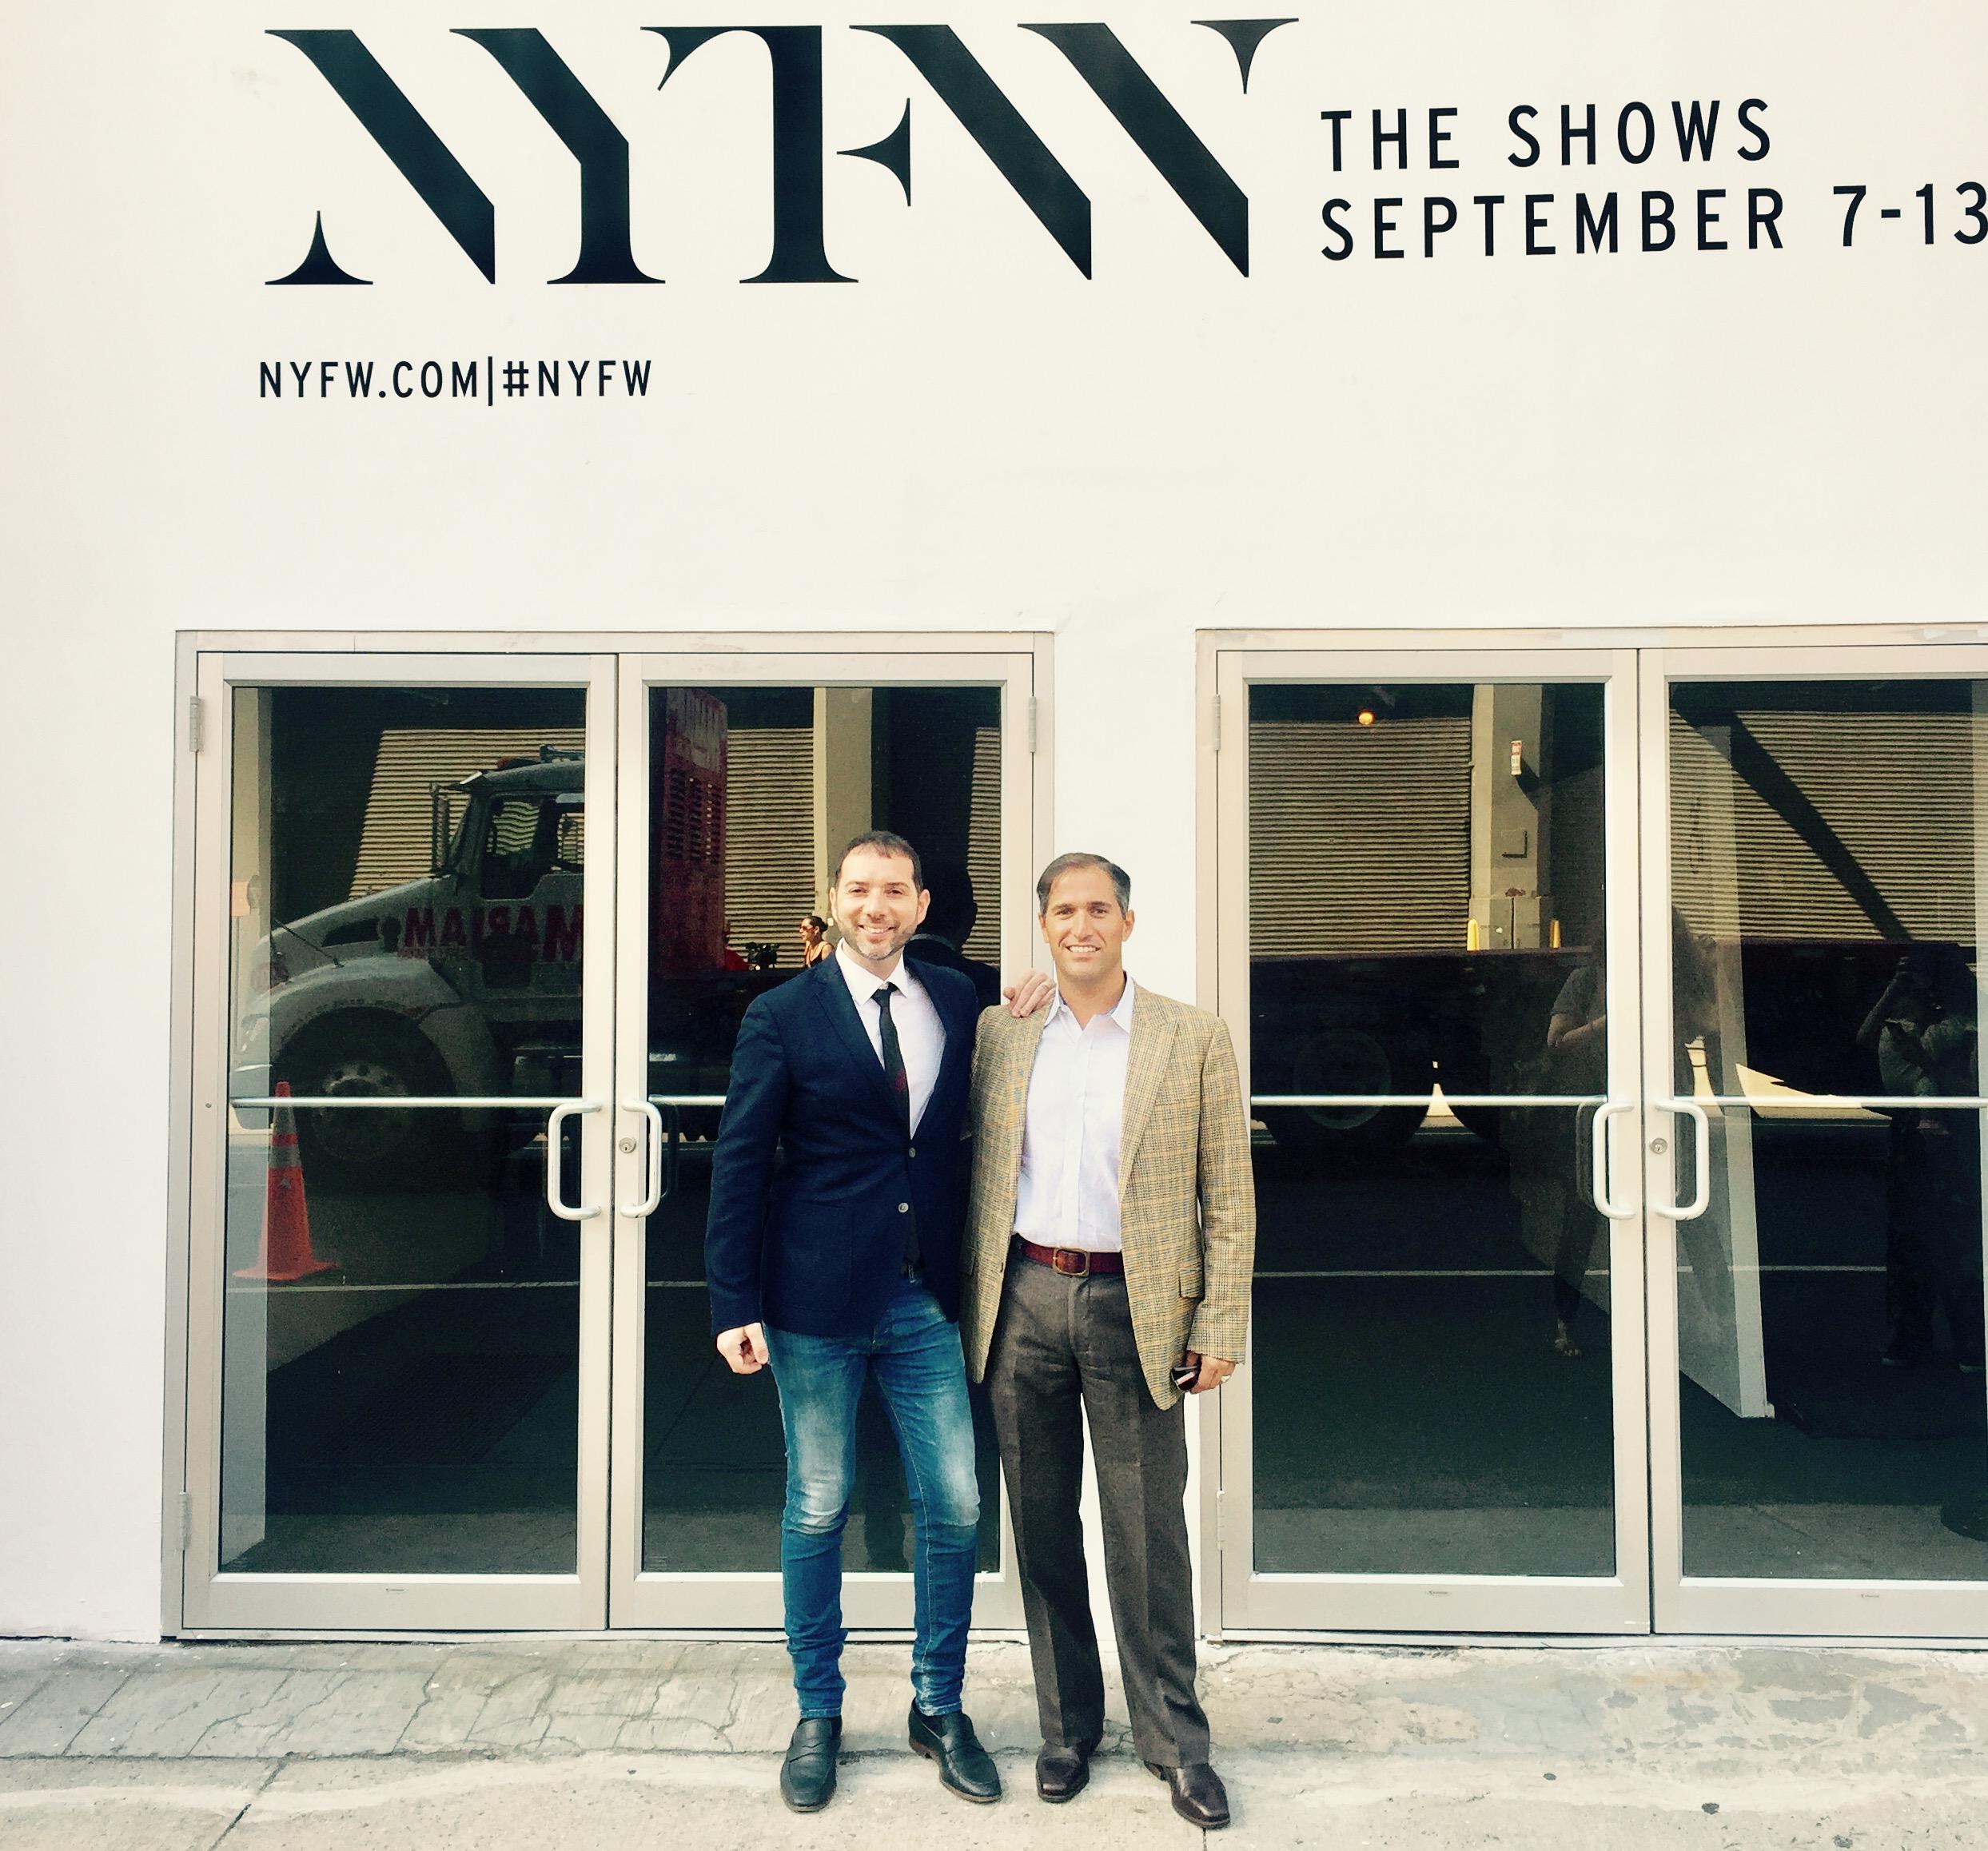 Francesco Iannelli and Joseph Costa at New York Fashion Week.